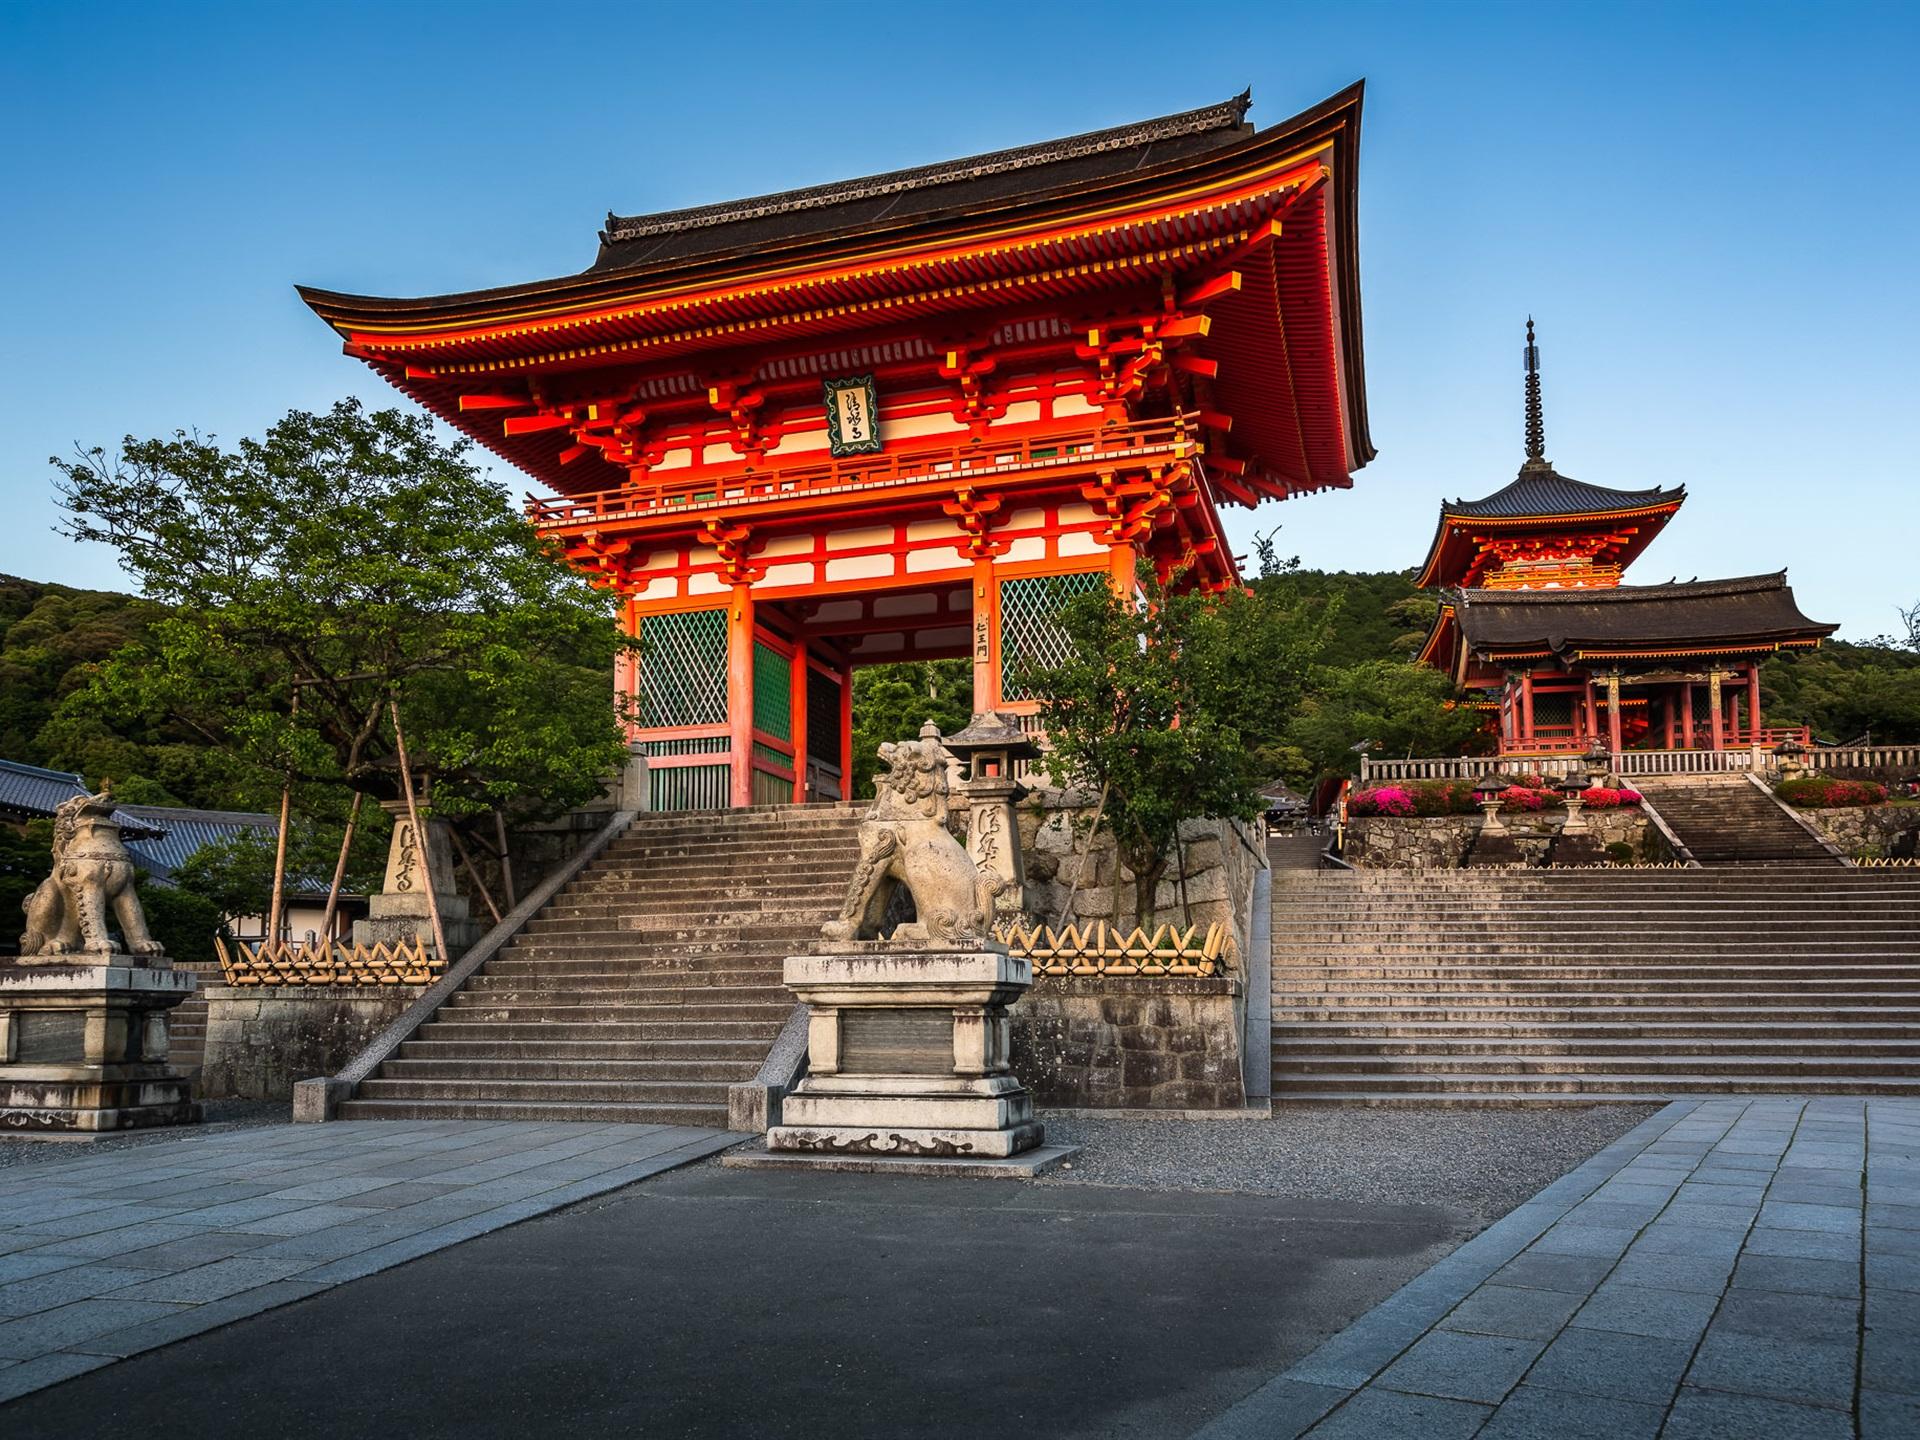 壁紙 京都 日本 清水寺 ゲート 旅行場所 1920x1440 Hd 無料の